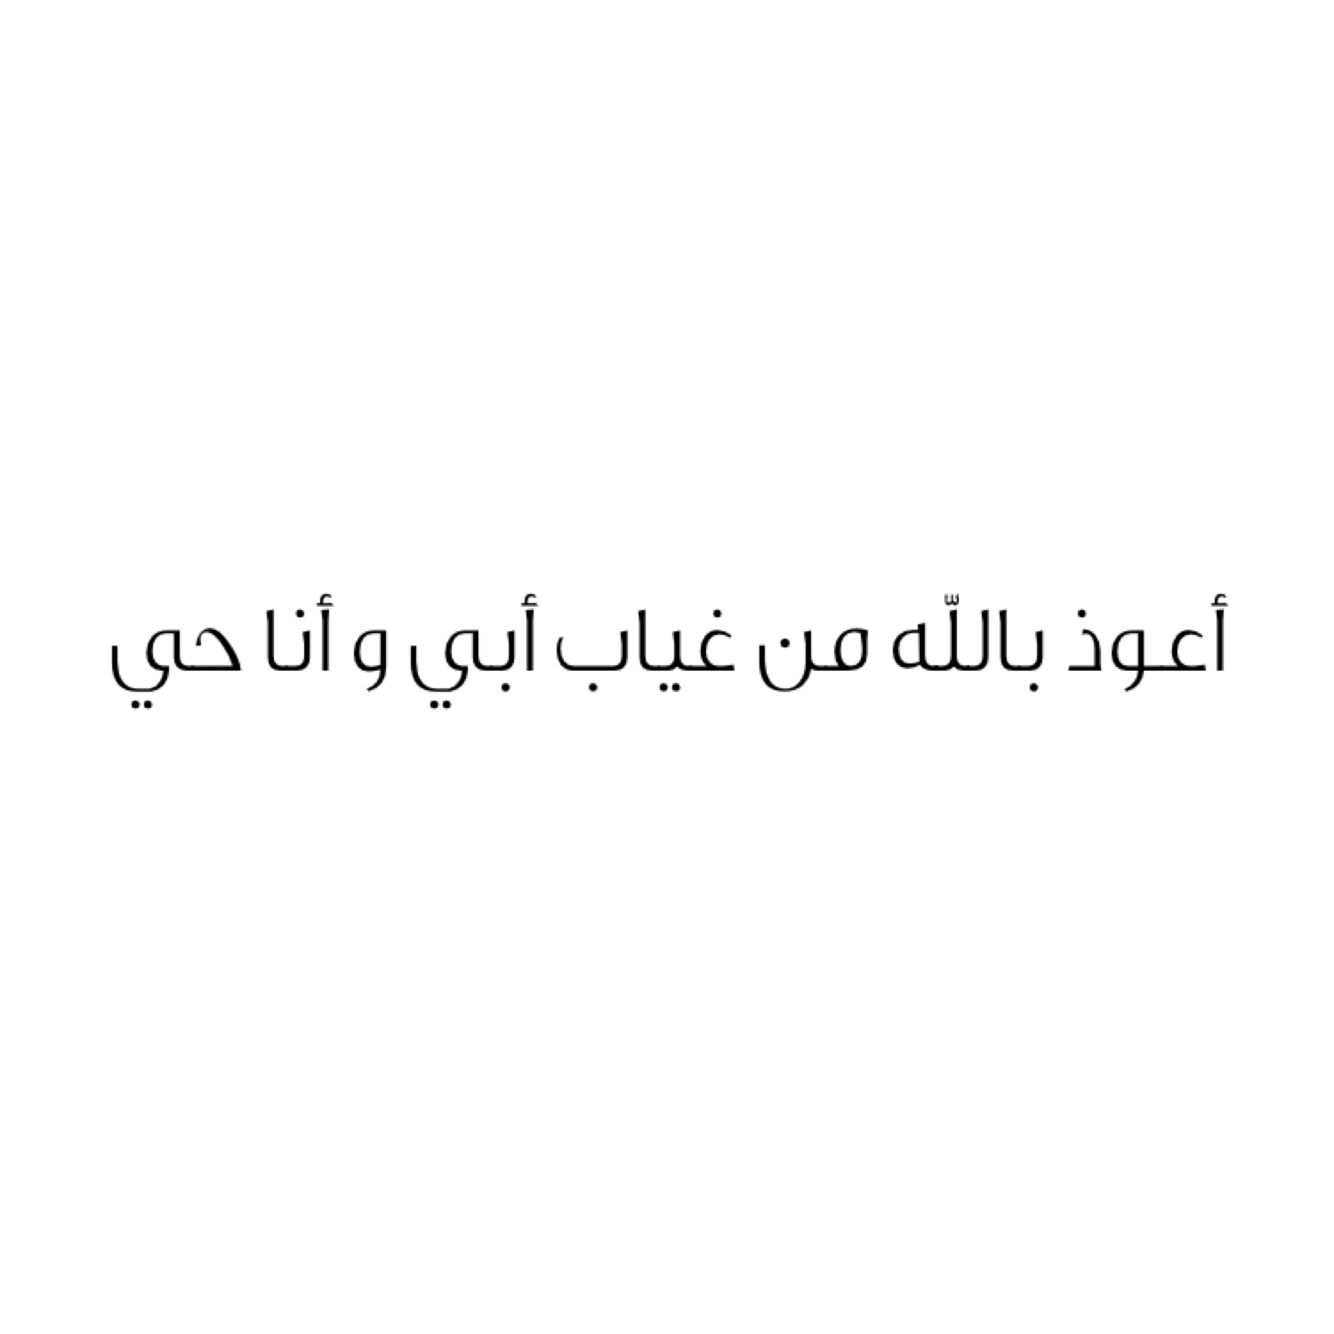 اللهم اشفه شفاء ليس بعده سقما Arabic Quotes Words Sayings